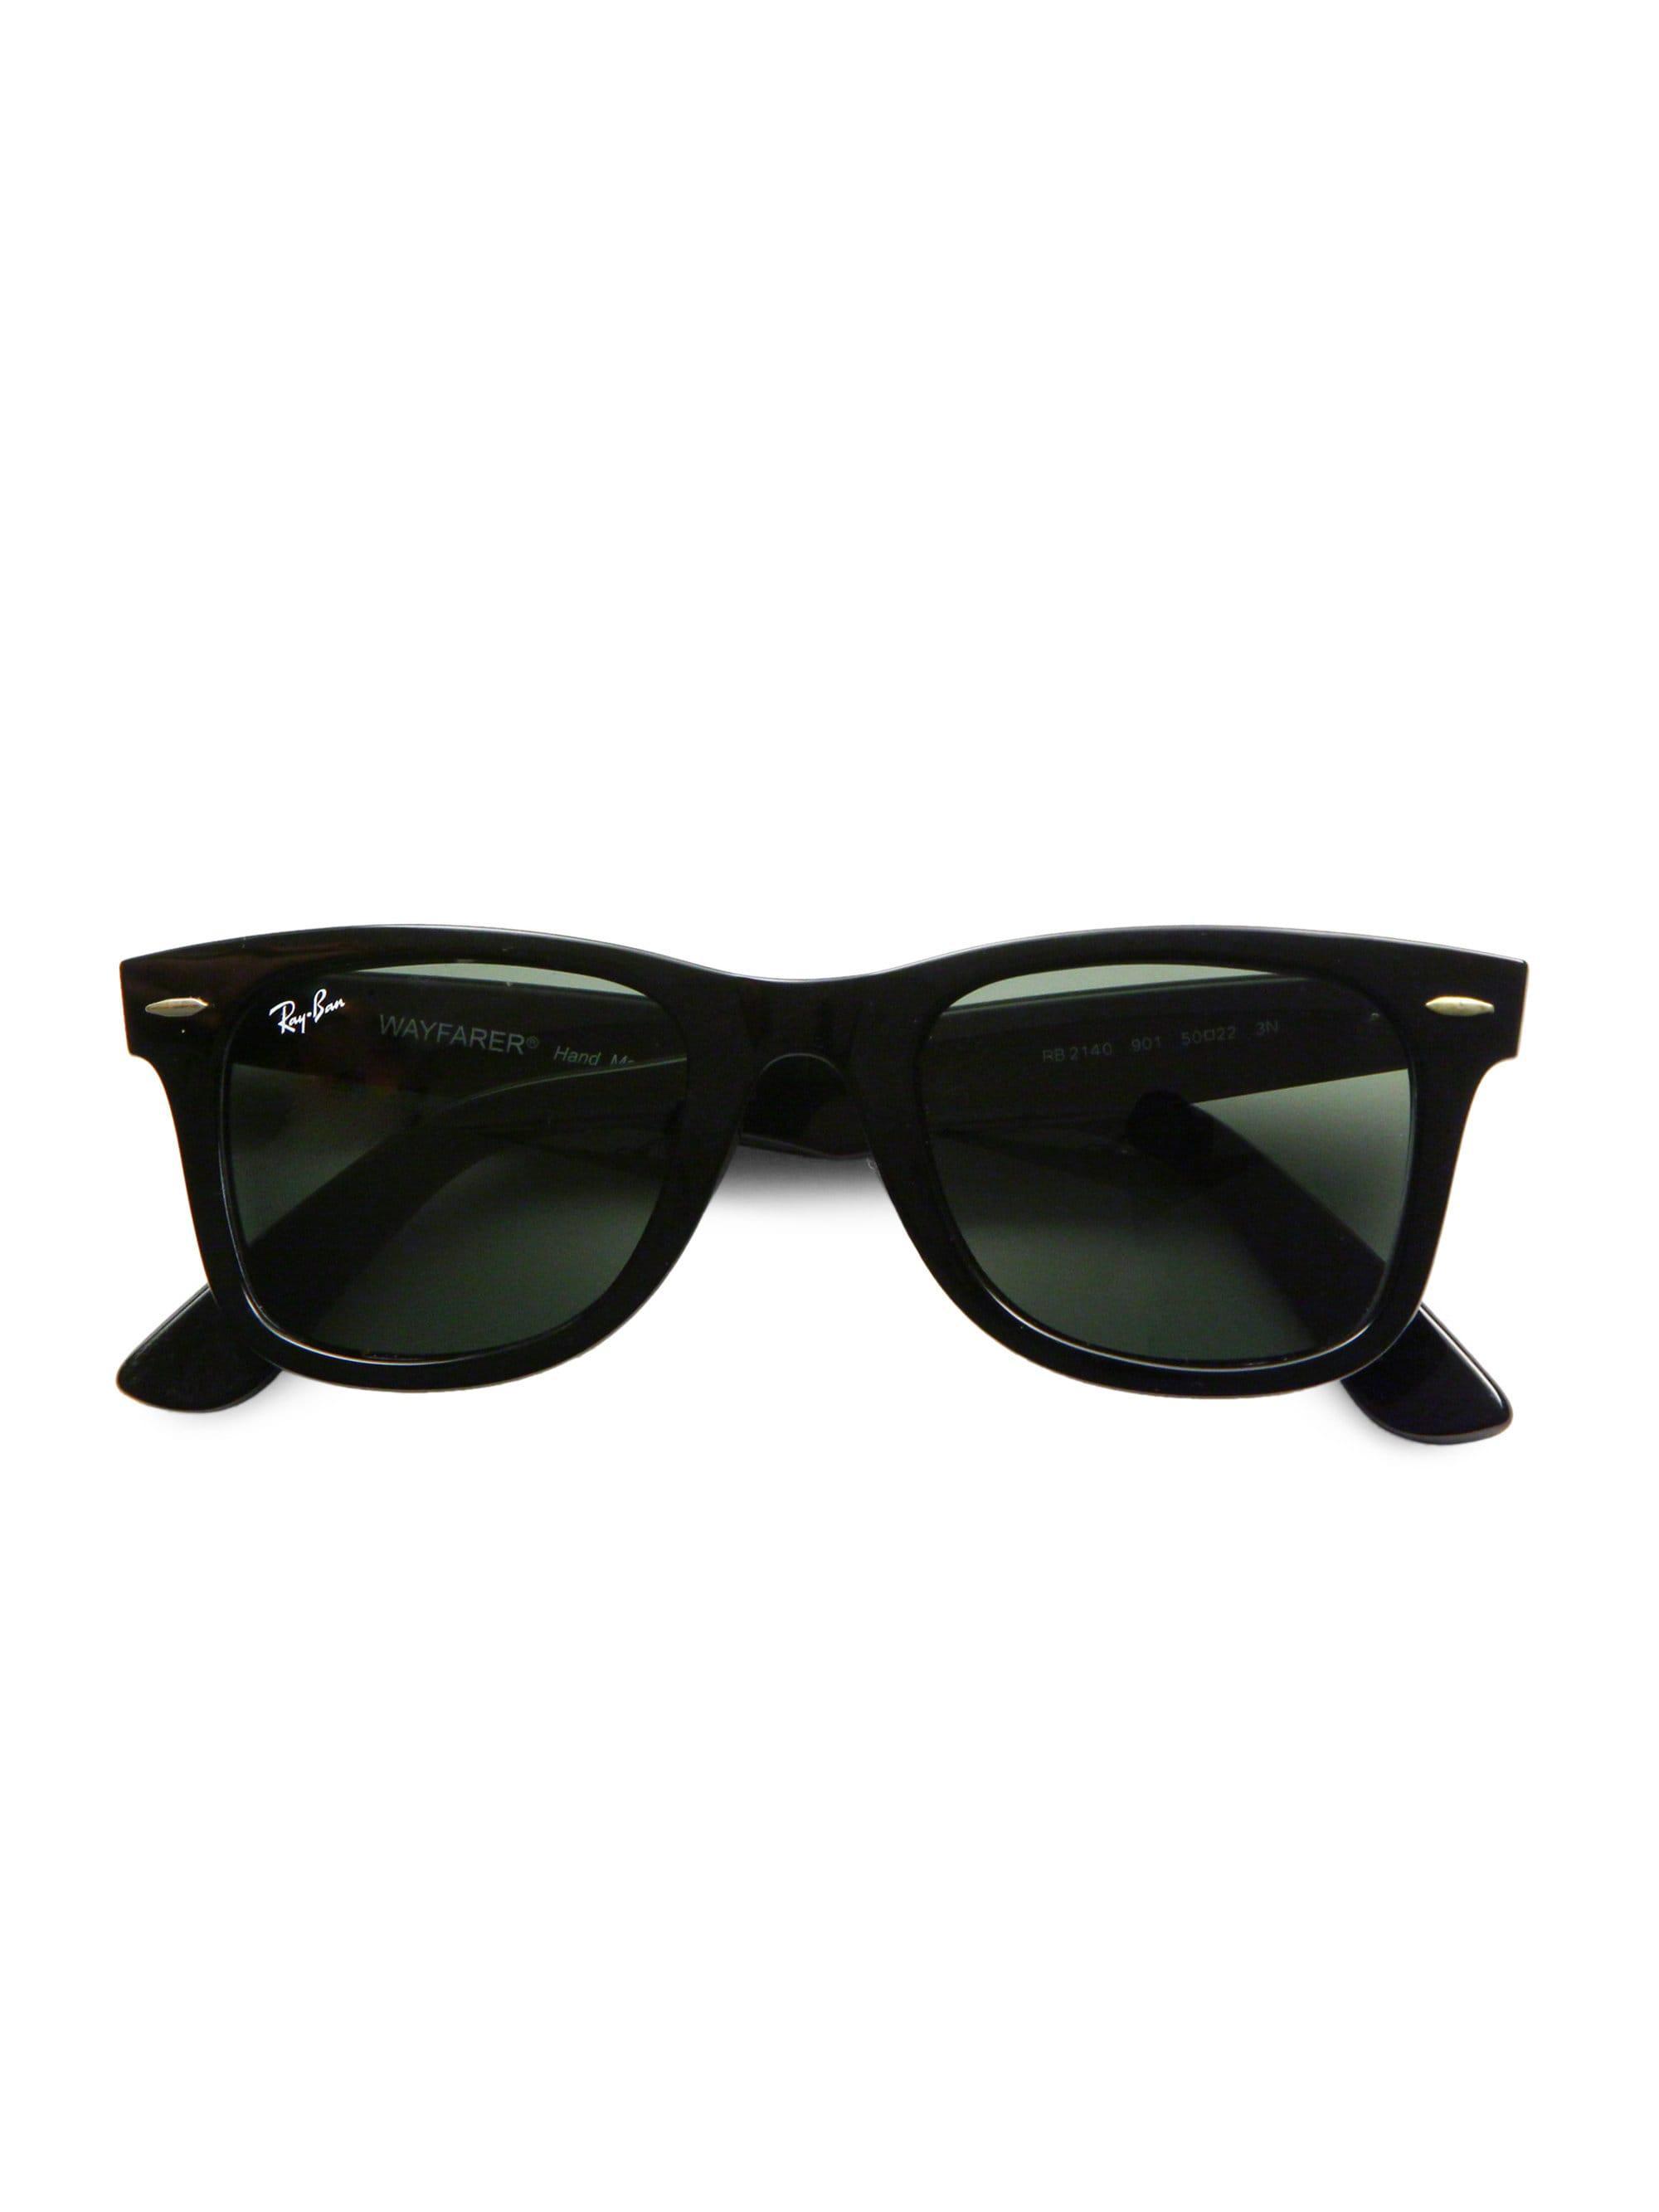 1303d961ce Lyst - Ray-Ban Men s 55mm Classic Wayfarer Sunglasses - Dark ...